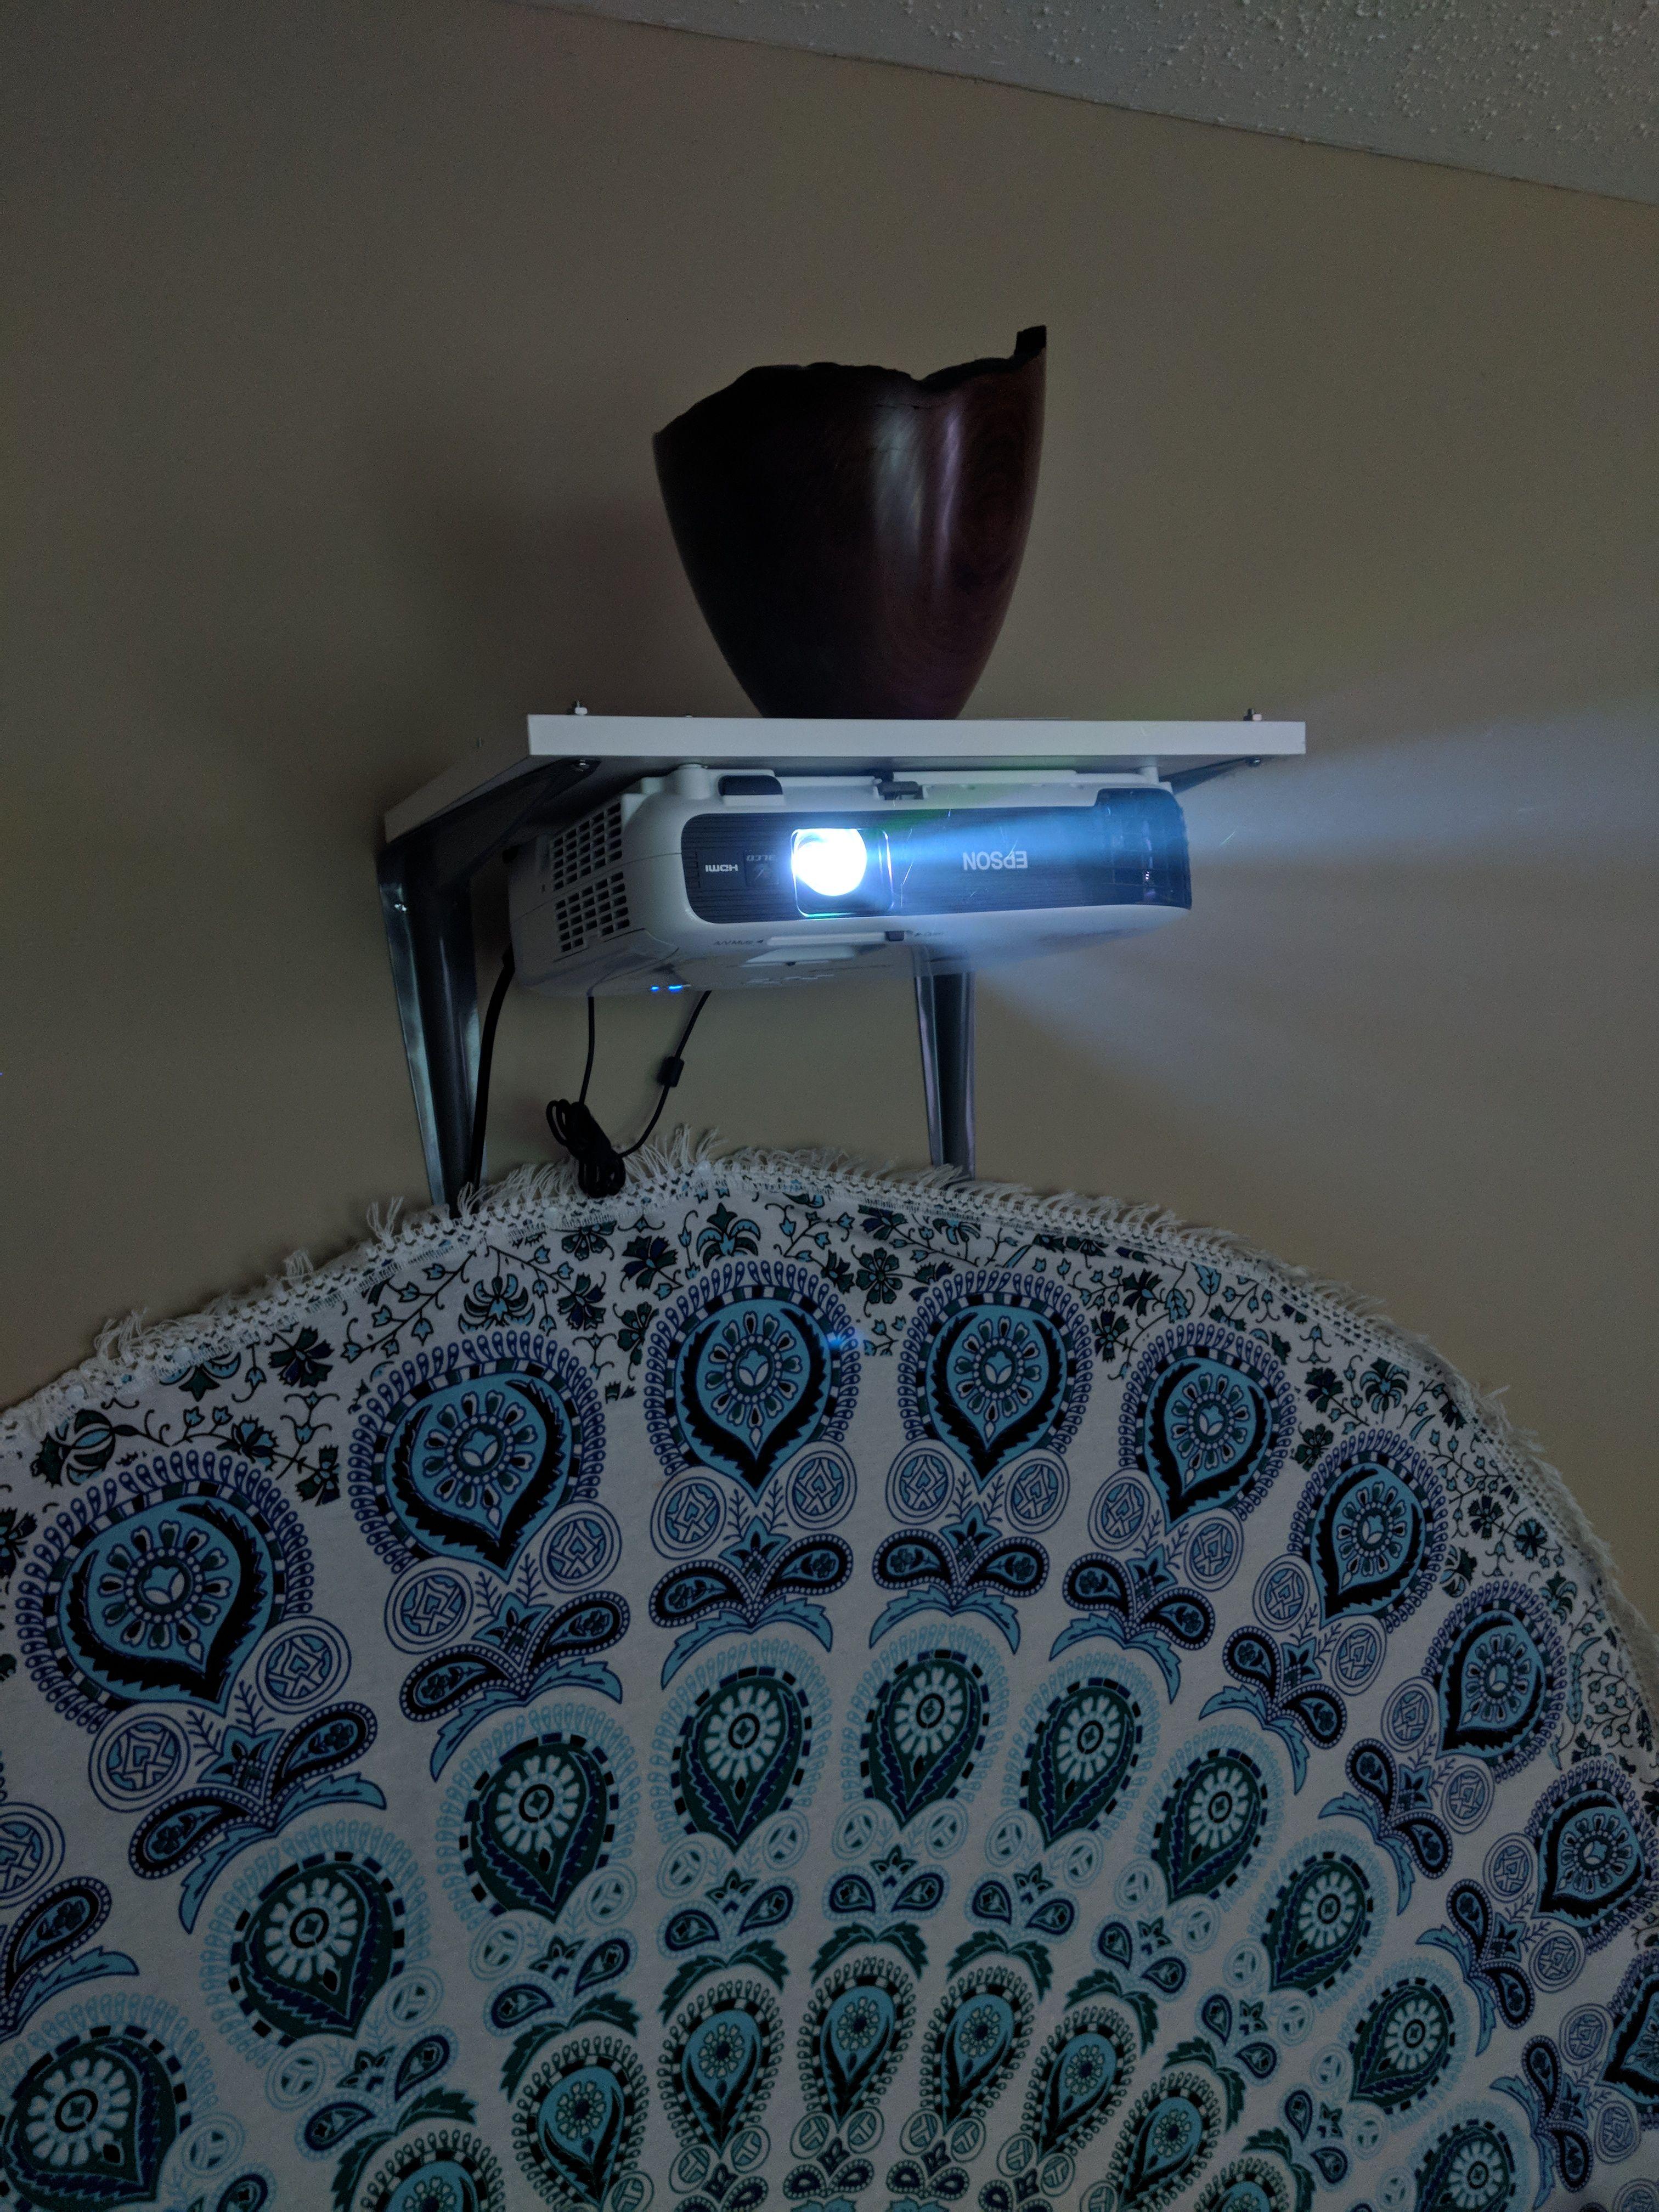 DIY Projector Wall Mount handmade crafts HowTo DIY